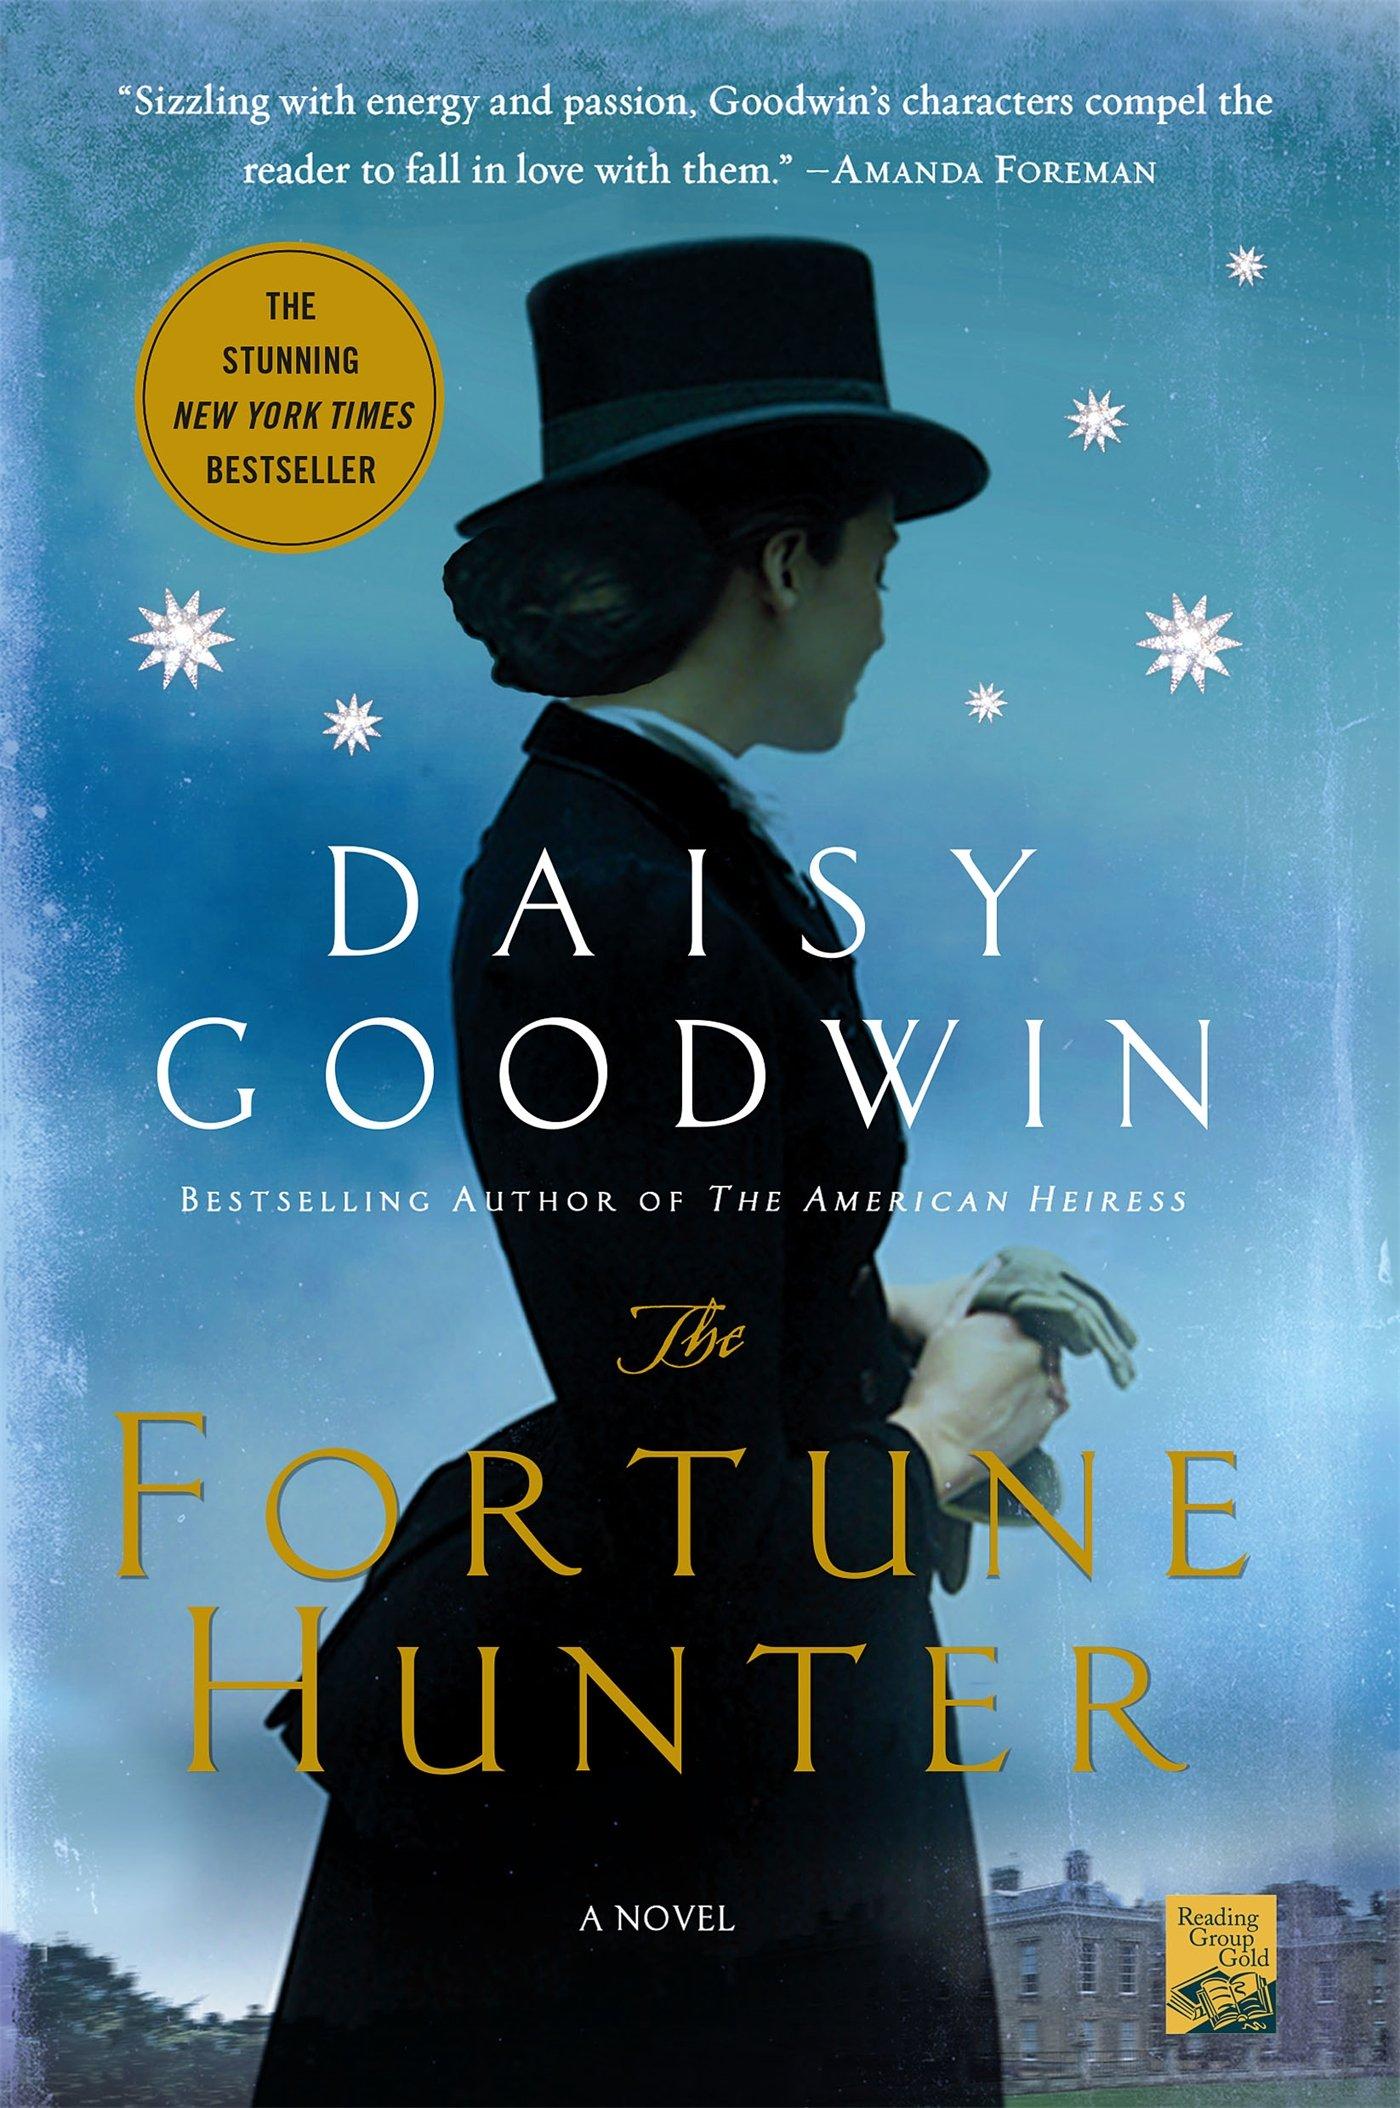 Amazon: The Fortune Hunter: A Novel (9781250043900): Daisy Goodwin:  Books